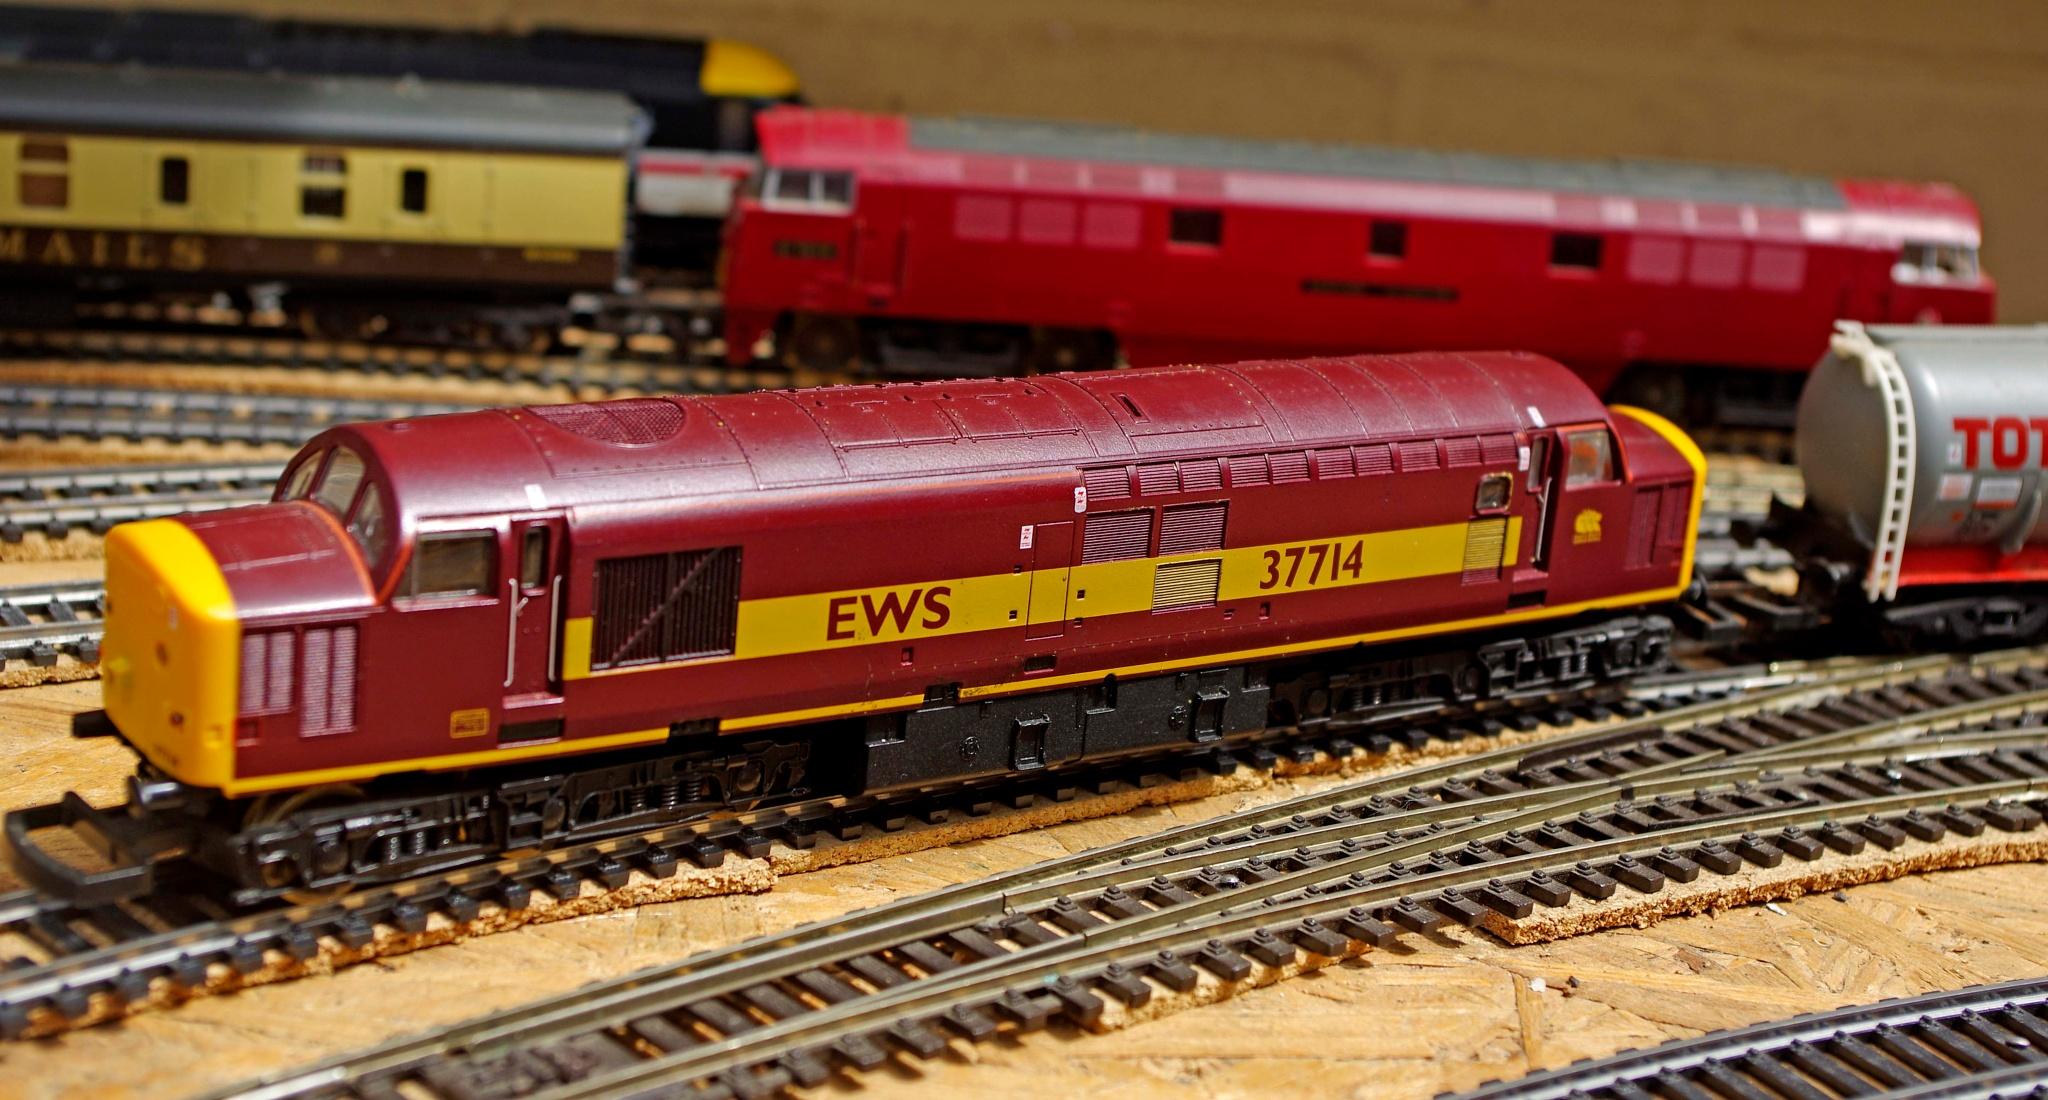 Model Railway Lima Class 37 EWS 37714-1-21 June 2016 by Owen Smithers